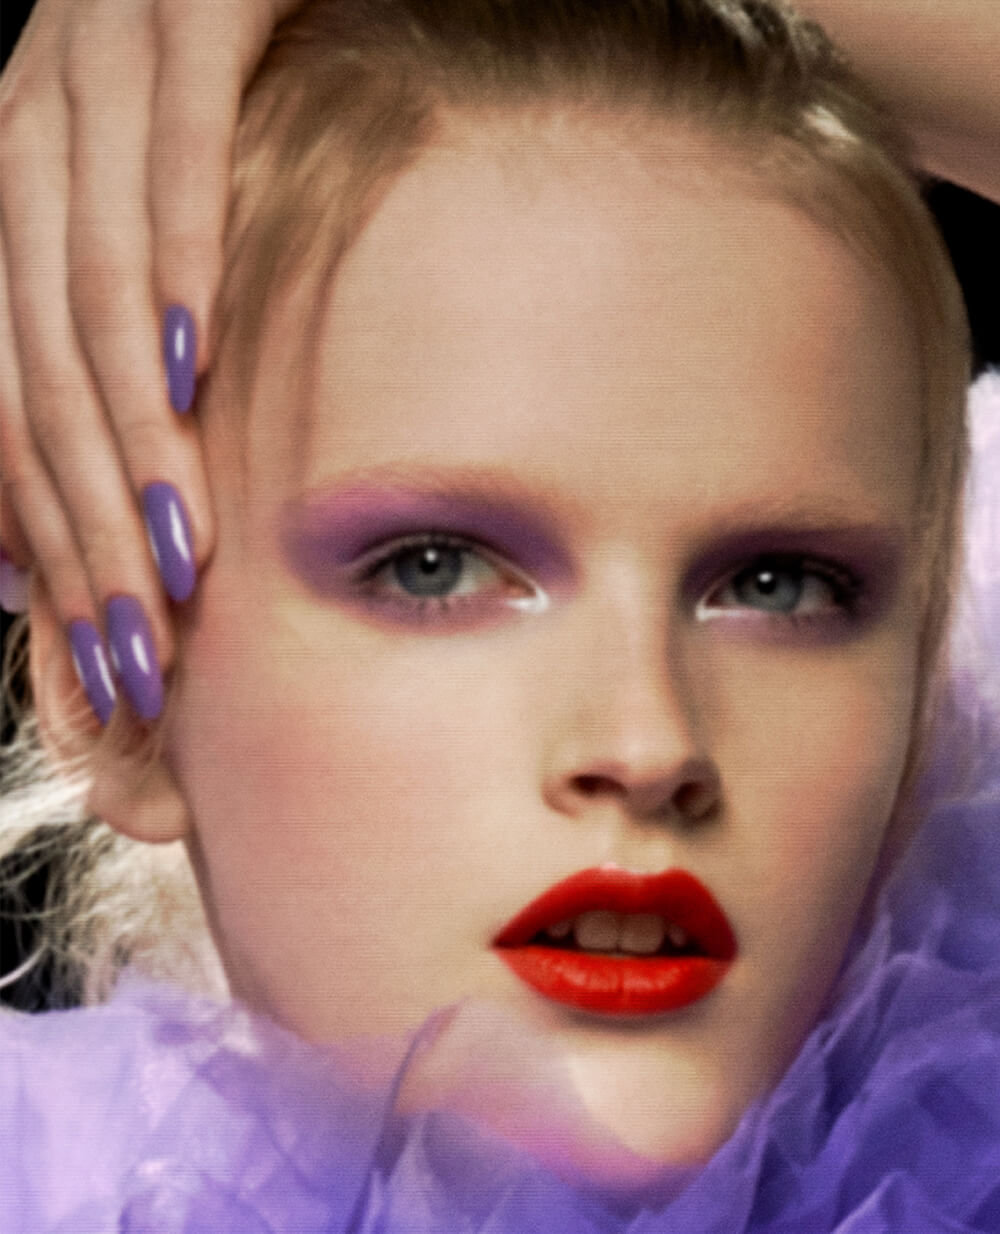 80e3455a803 Hannah Motler wears PAT McGRATH LABS – Mothership III Eyeshadow Palette  Subversive, Mothership I Eyeshadow Palette Subliminal, FetishEyes Mascara,  ...